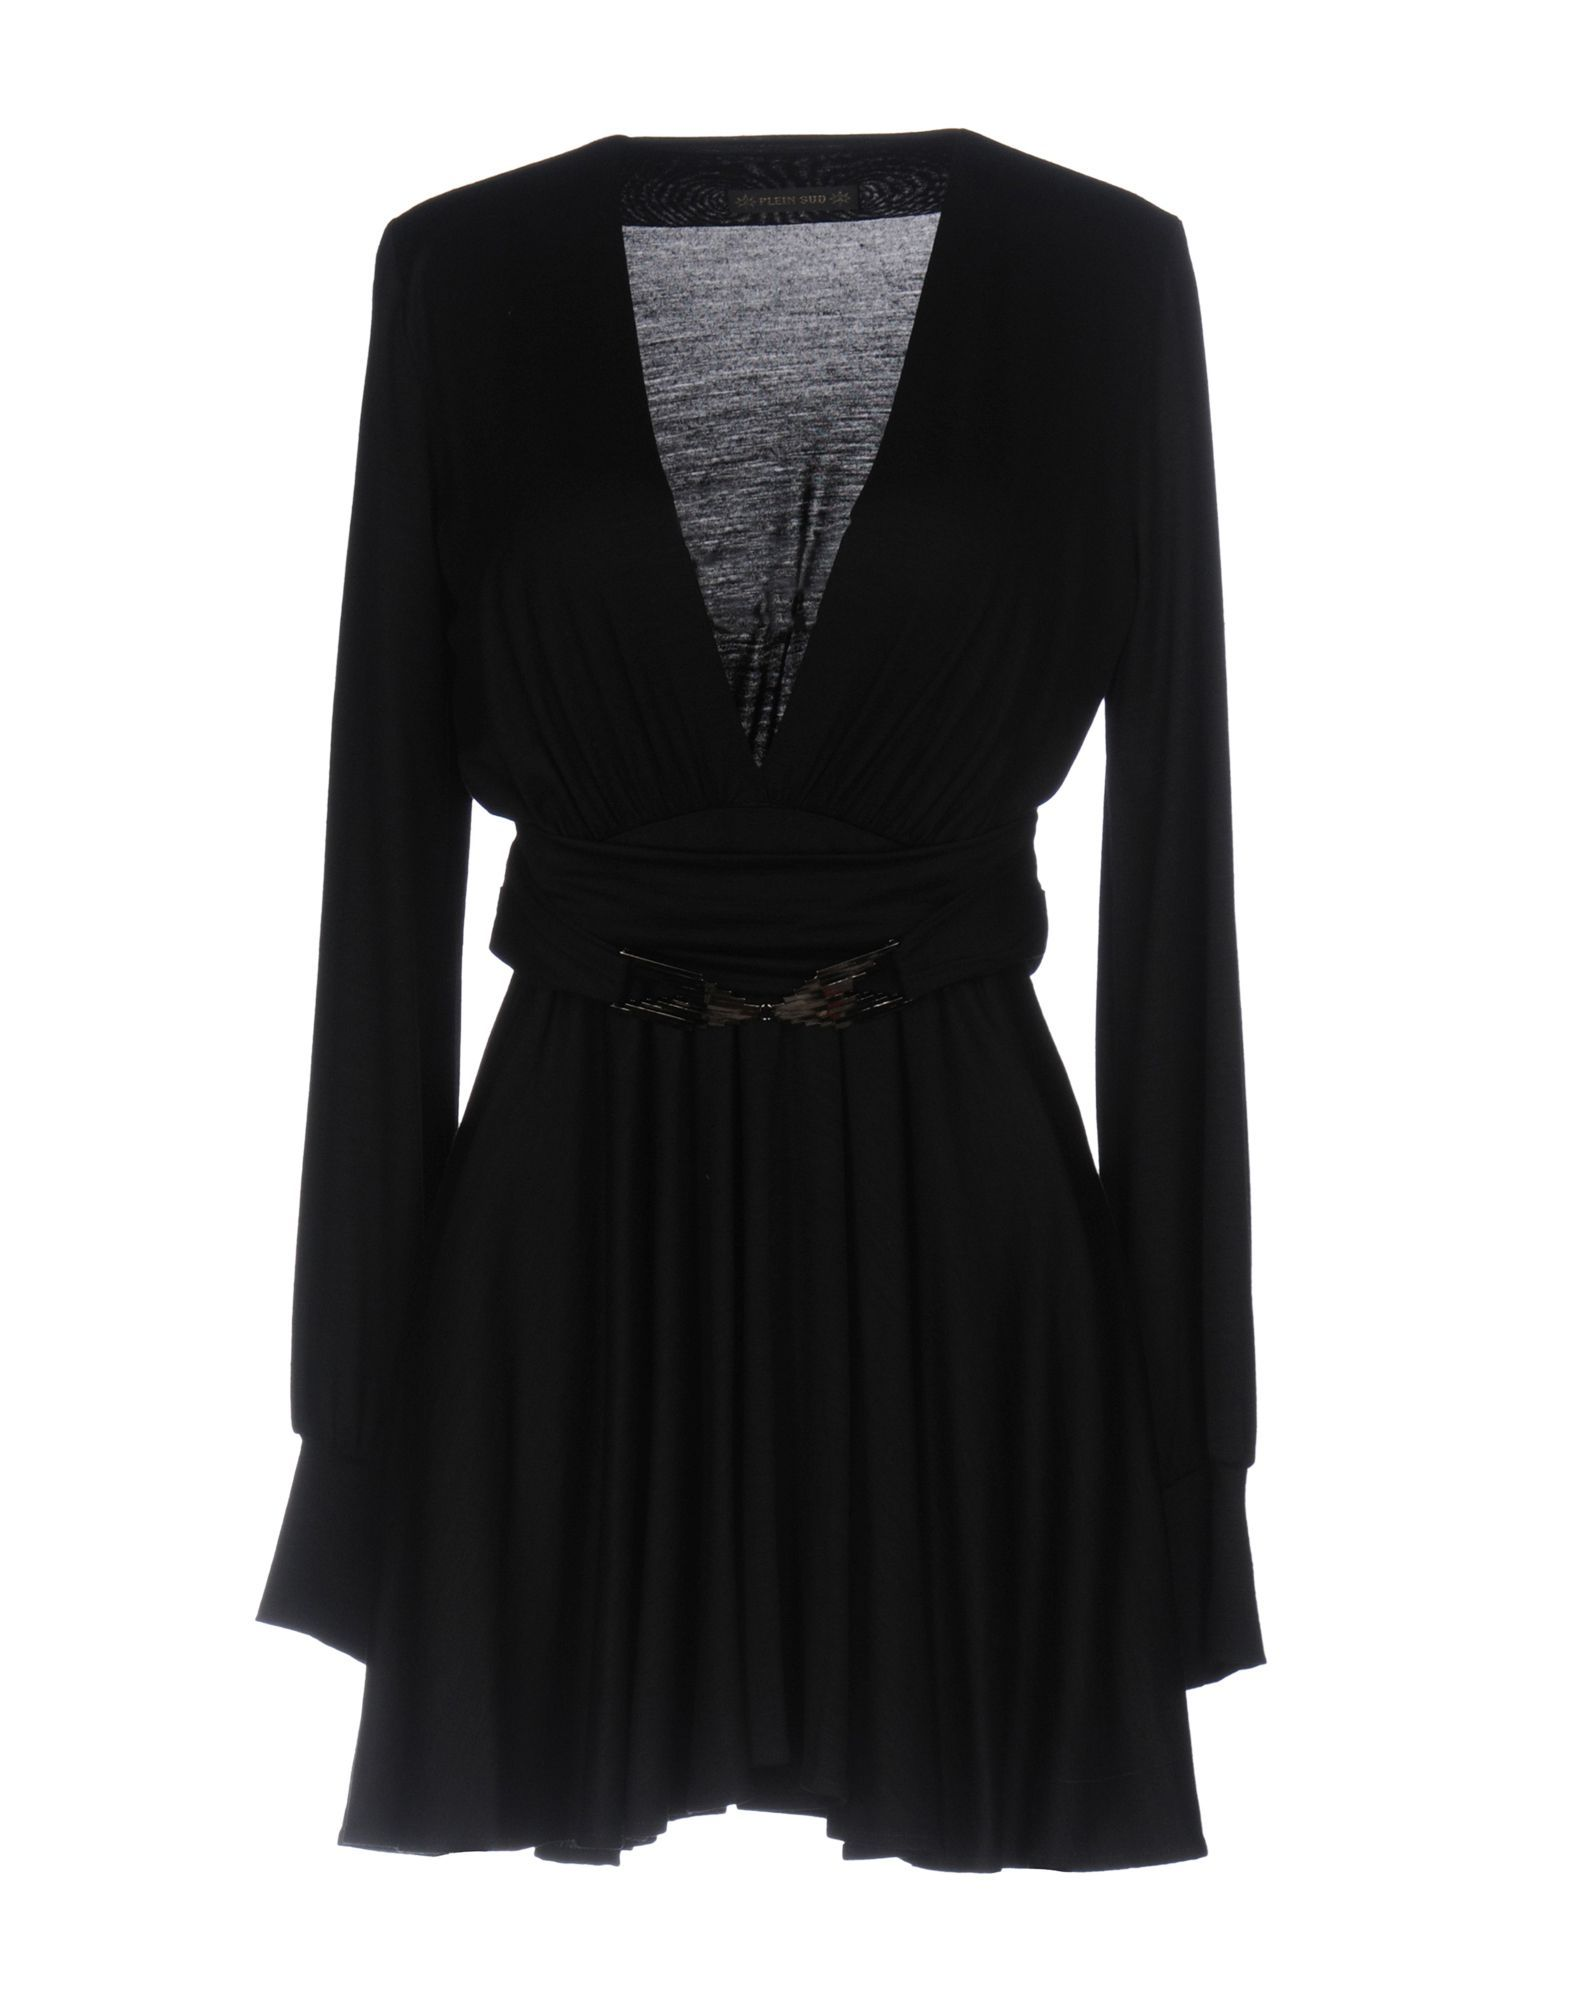 Plein Sud Black Virgin Wool Long Sleeve Dress